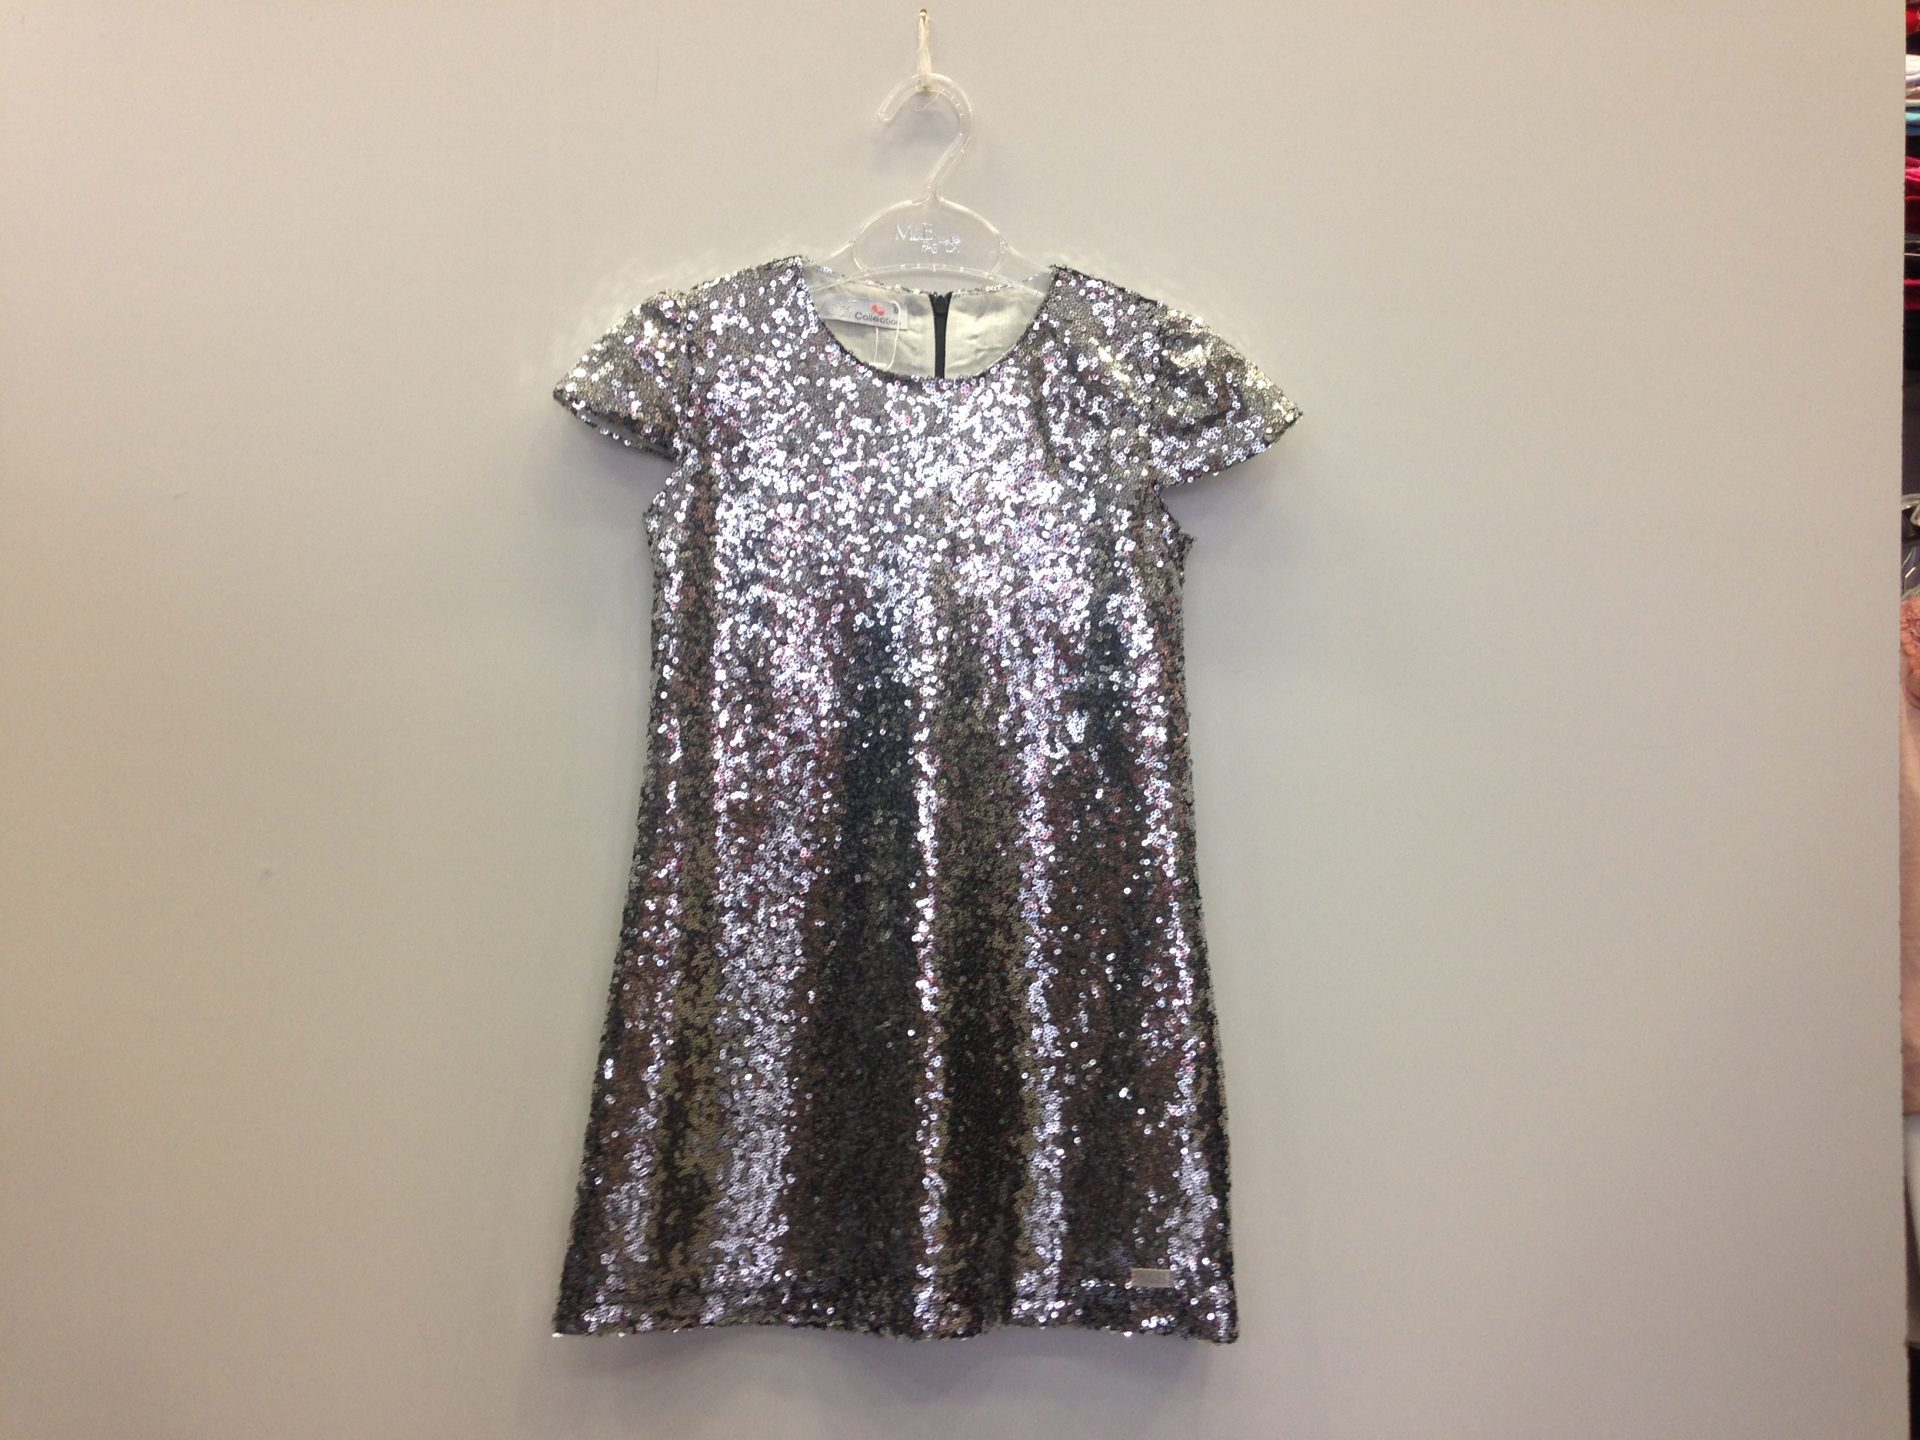 9e2d4647d46 M&B φόρεμα όλο παγιέτα ασημί κ/μ σε άλφα γραμμή   Kids Club